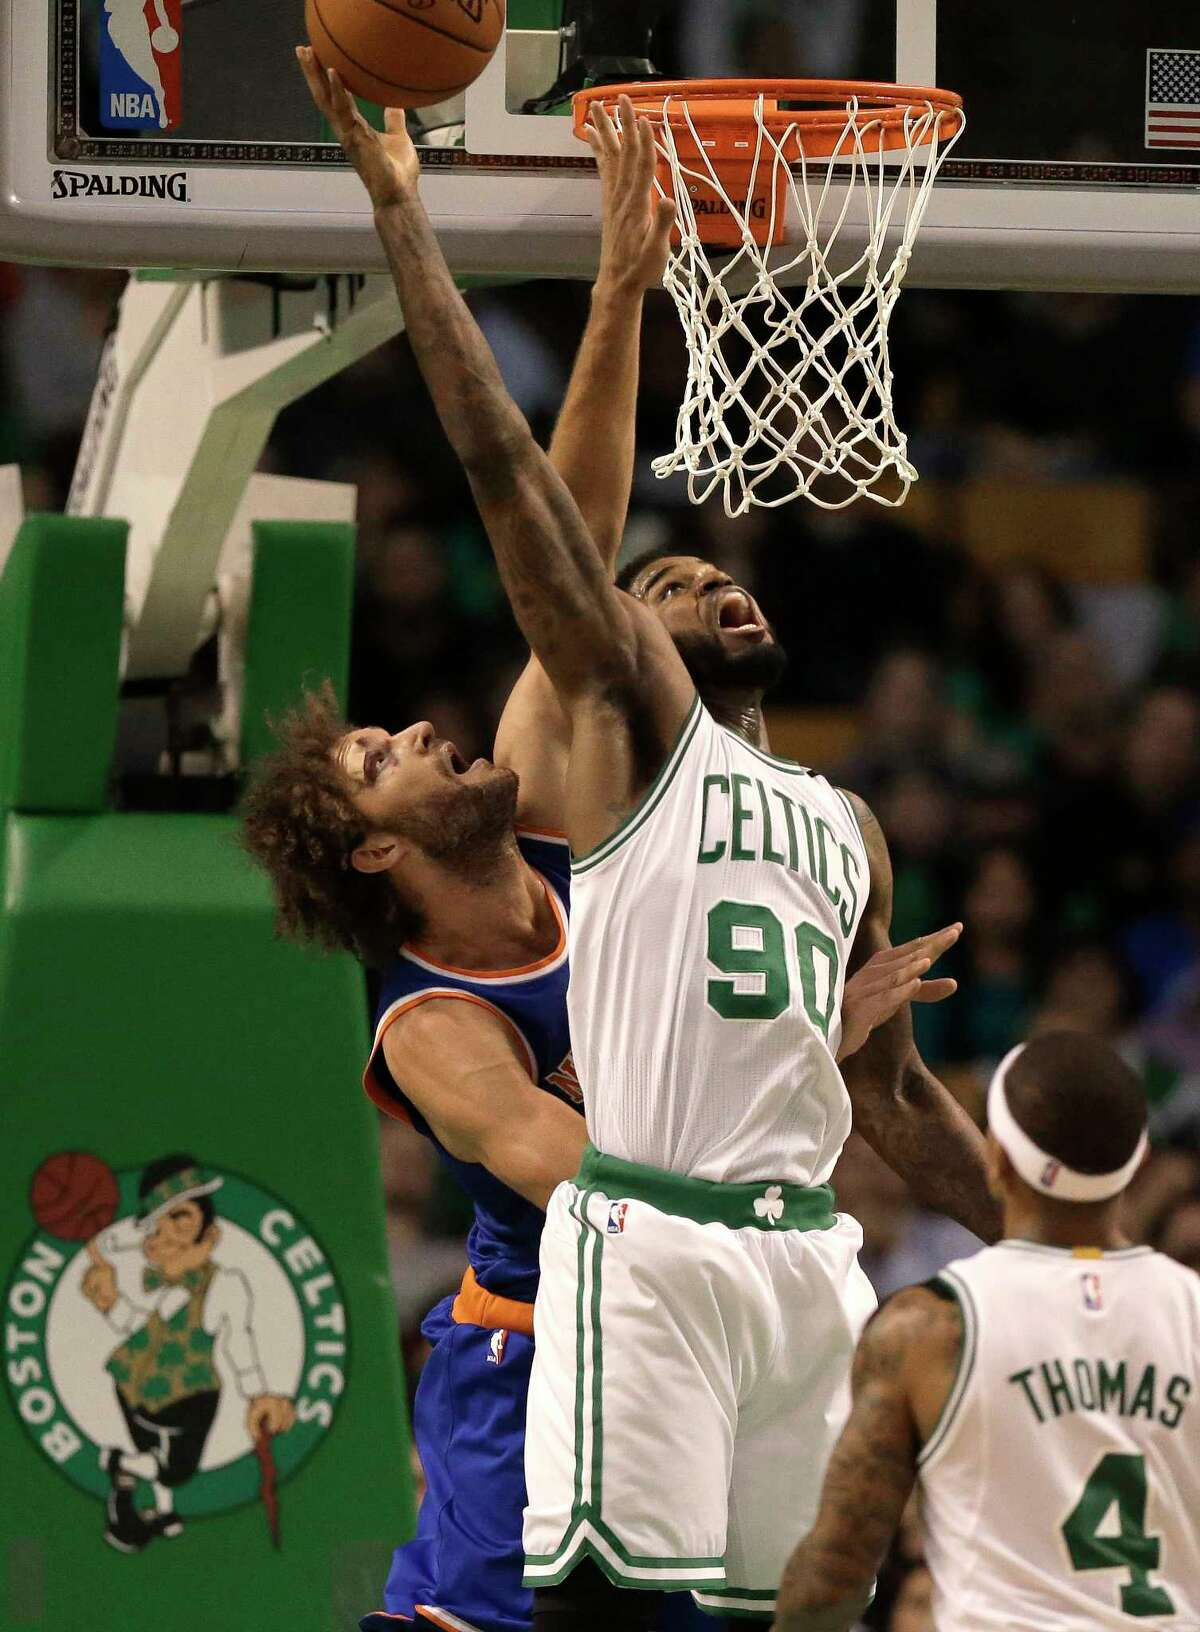 Knicks center Robin Lopez, left, vies for control of the ball with Celtics forward Amir Johnson on Sunday.